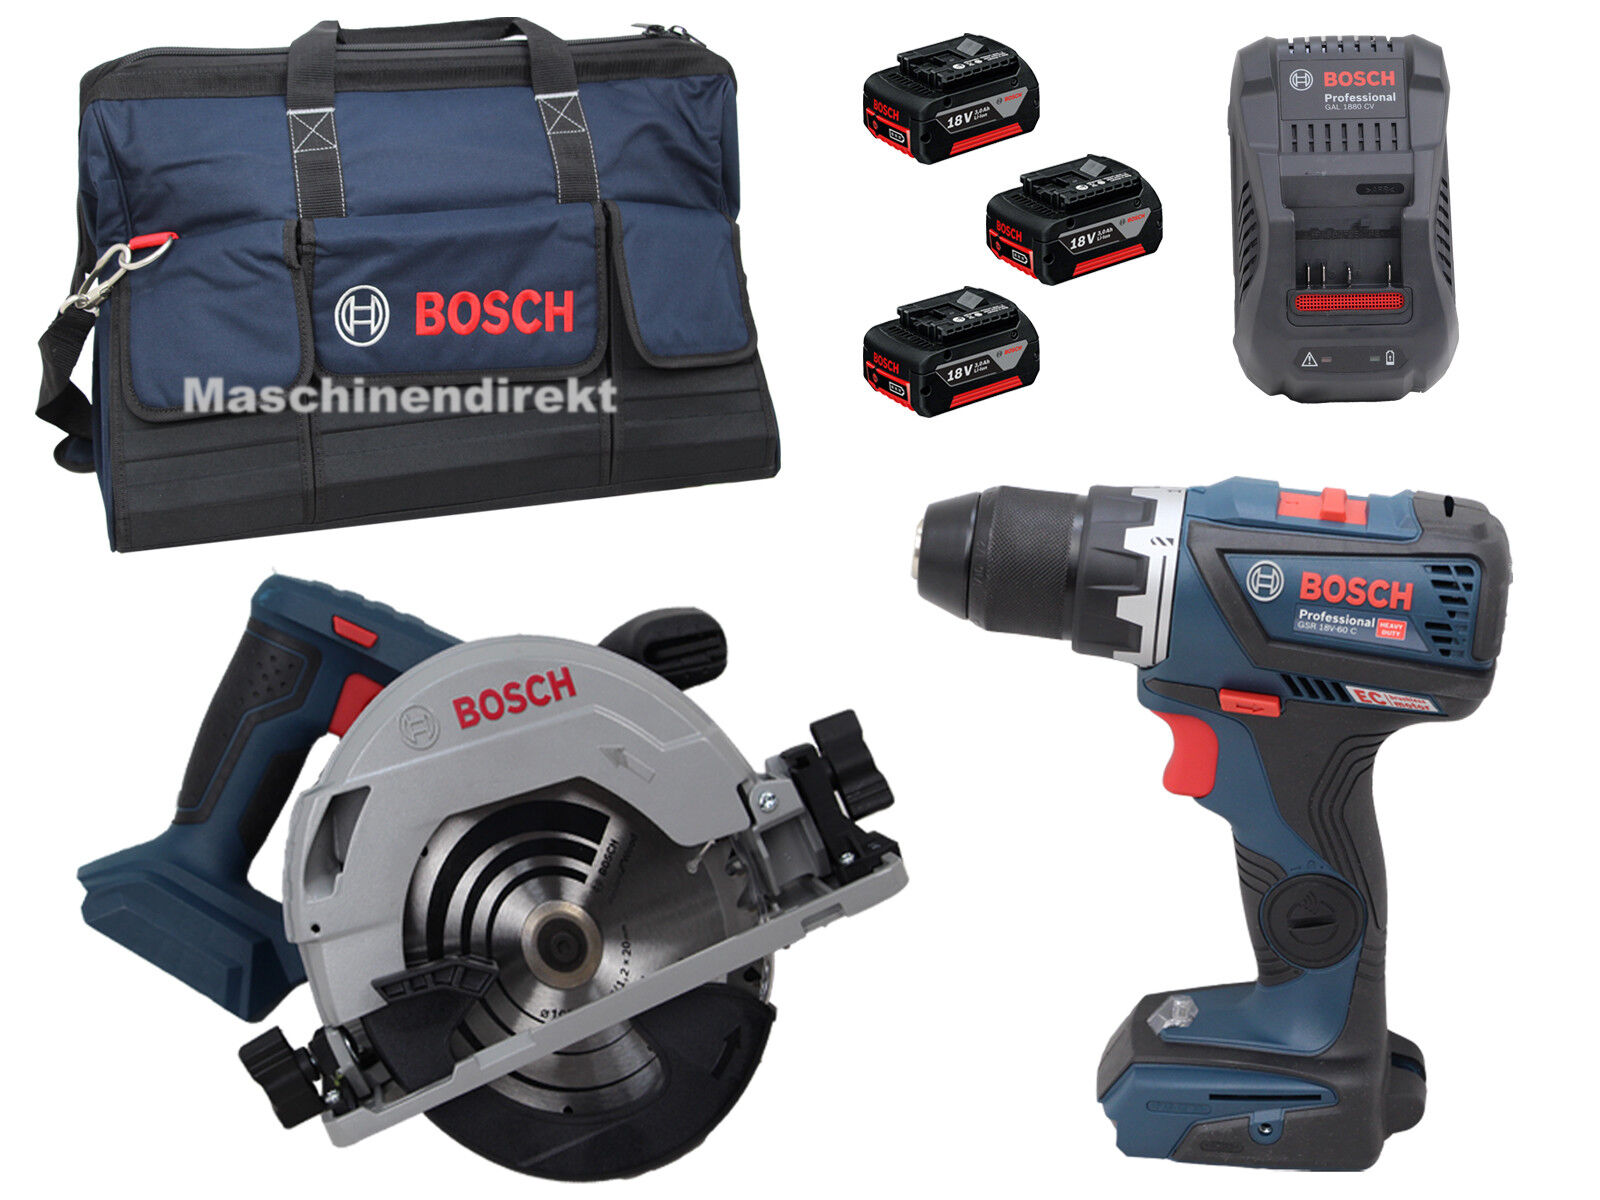 Bosch Akku Set Handwerkertasche + GKS18V-57 G + GSR18V-60 C + 3x 3.0 ah Akkus